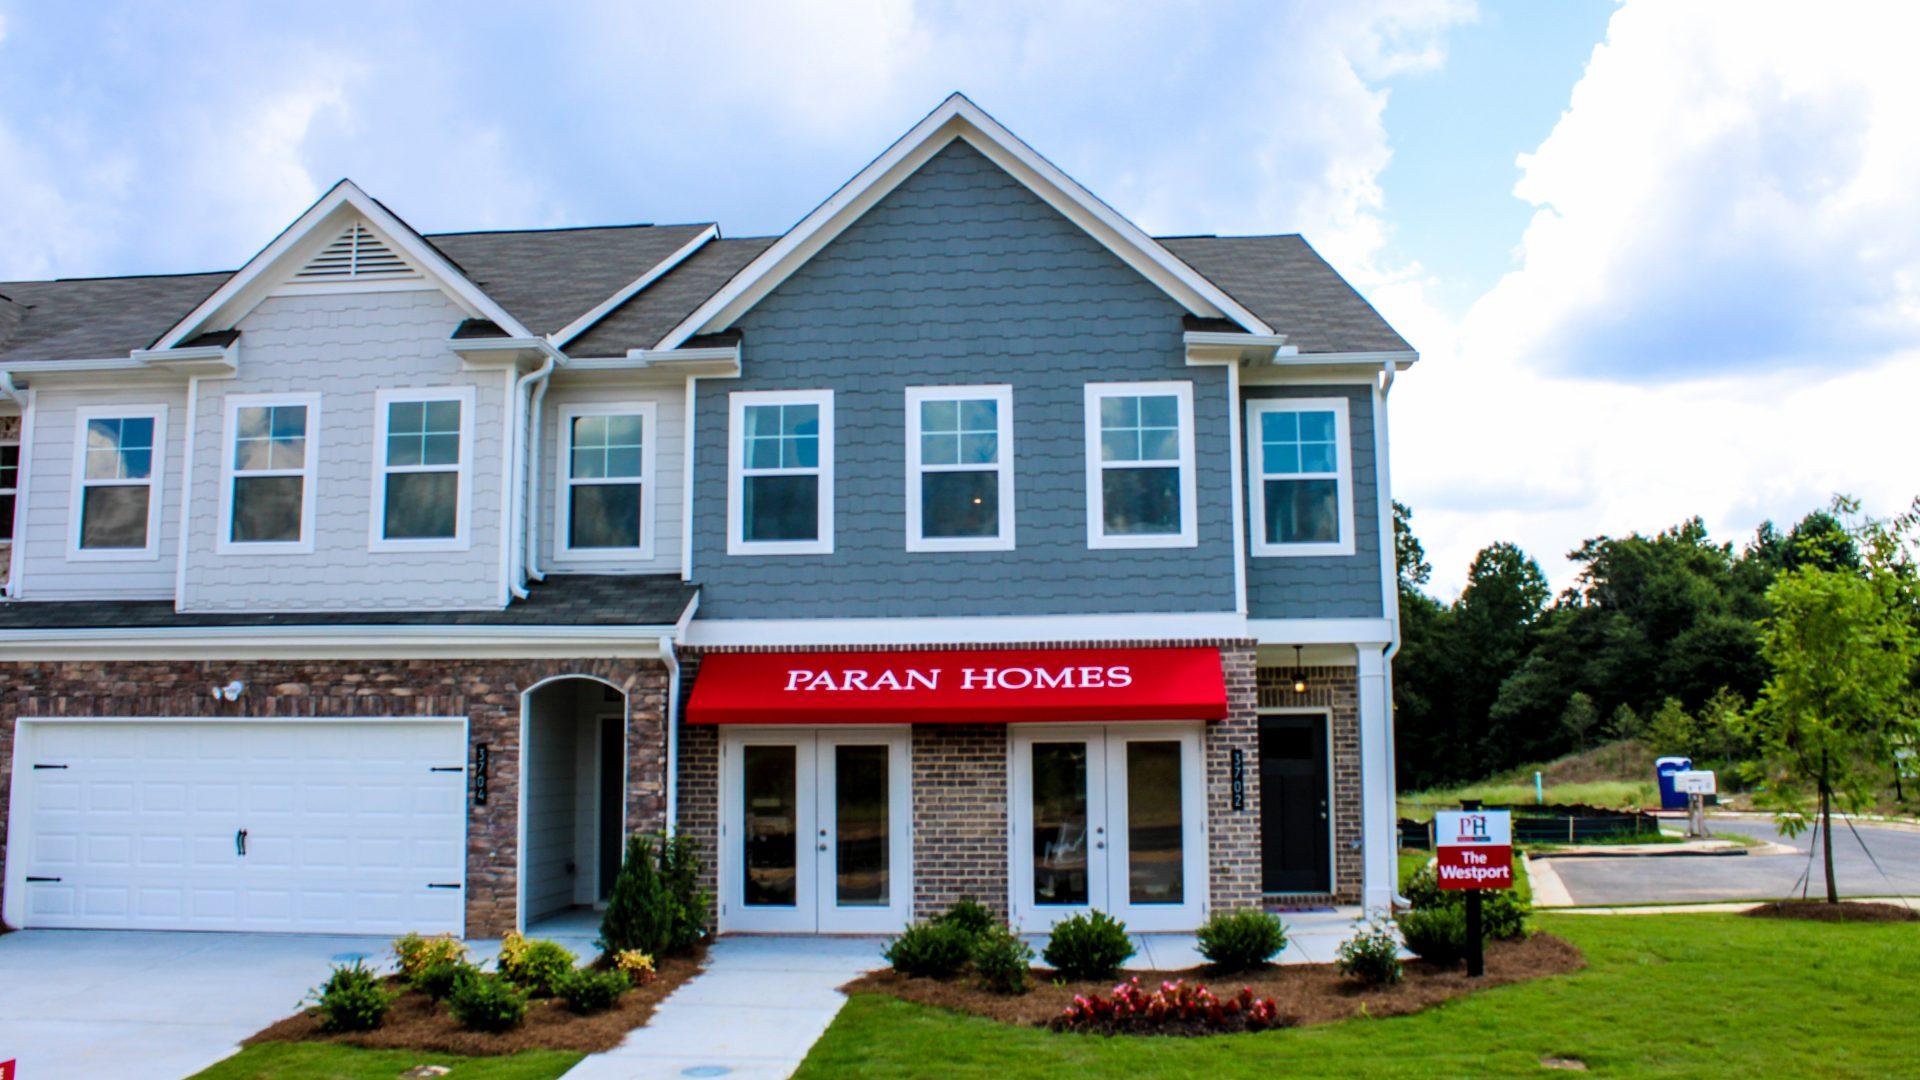 Sweetwater Landing Townhomes by Paran Homes in Powder Springs, GA